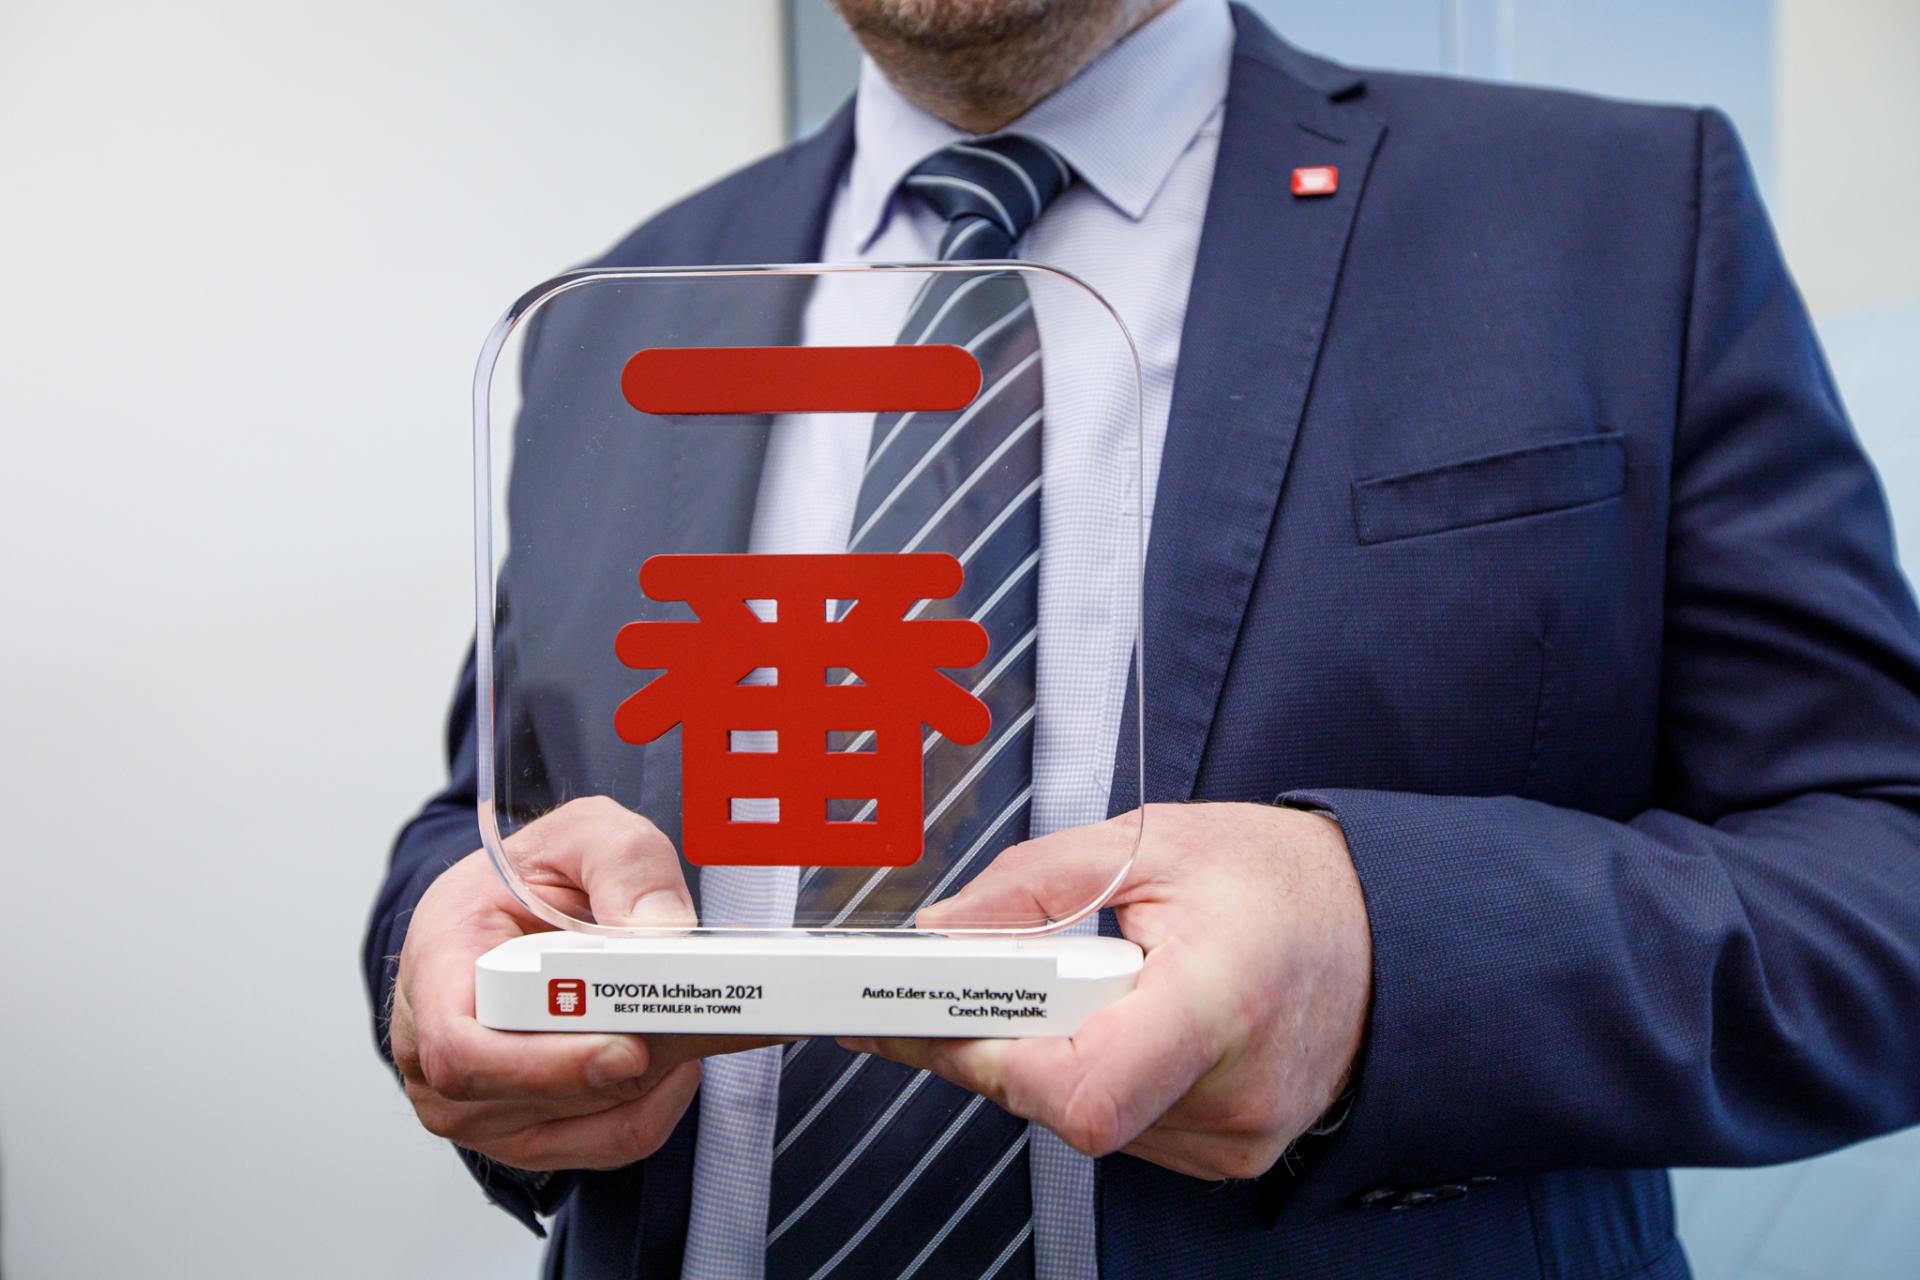 Auto Eder - držitel ceny Ichiban 2021